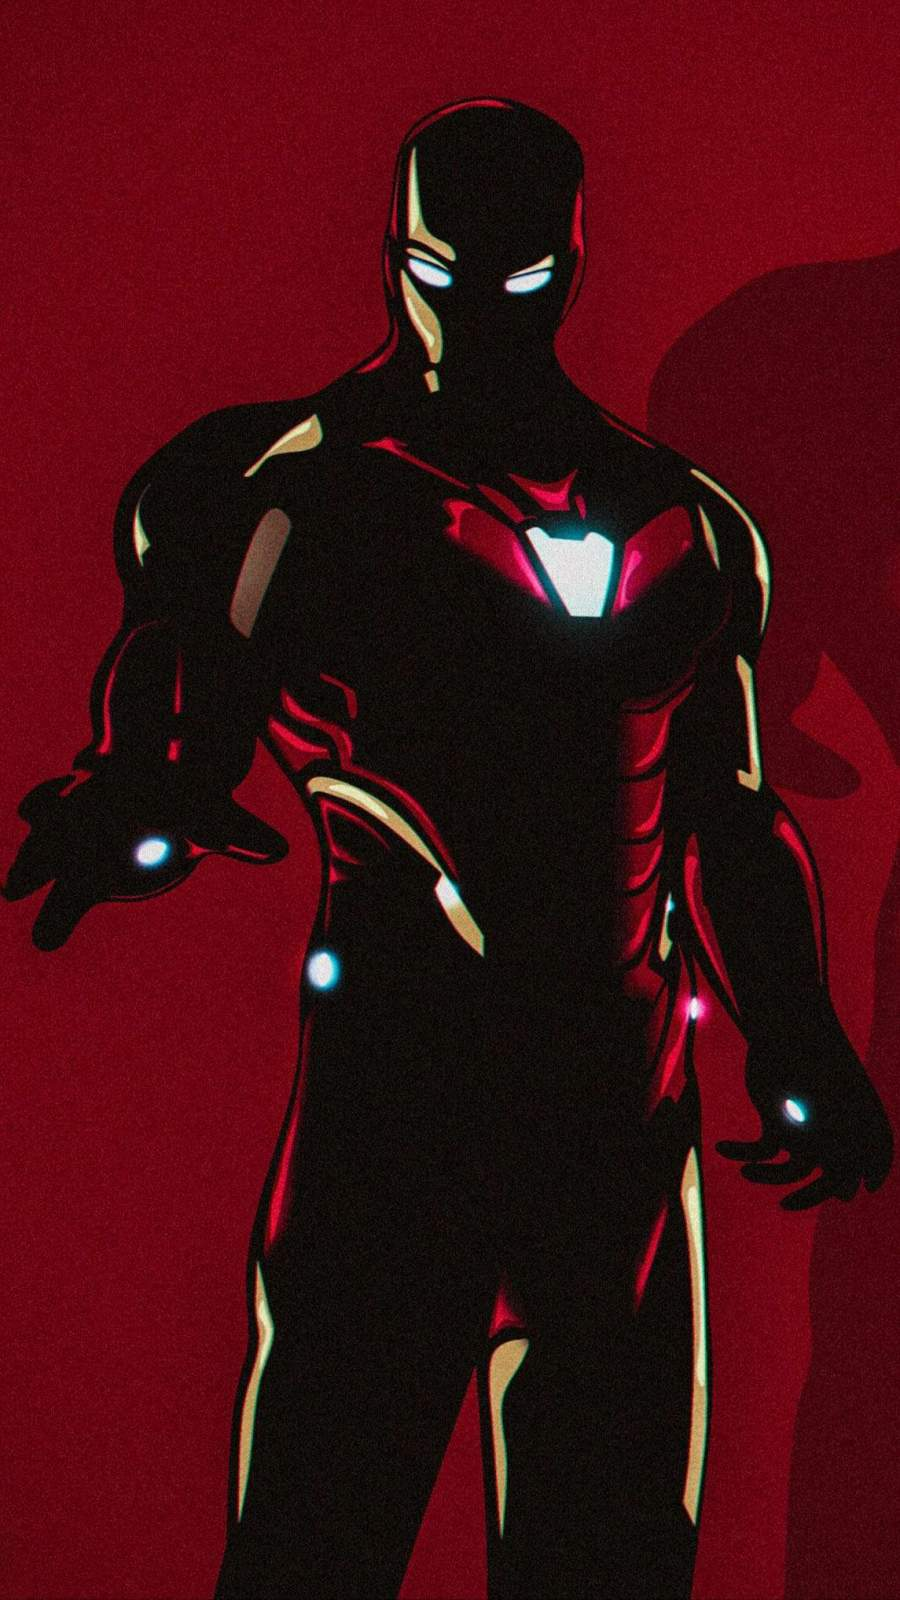 Mark85 Dark Armor Iron Man iPhone Wallpaper